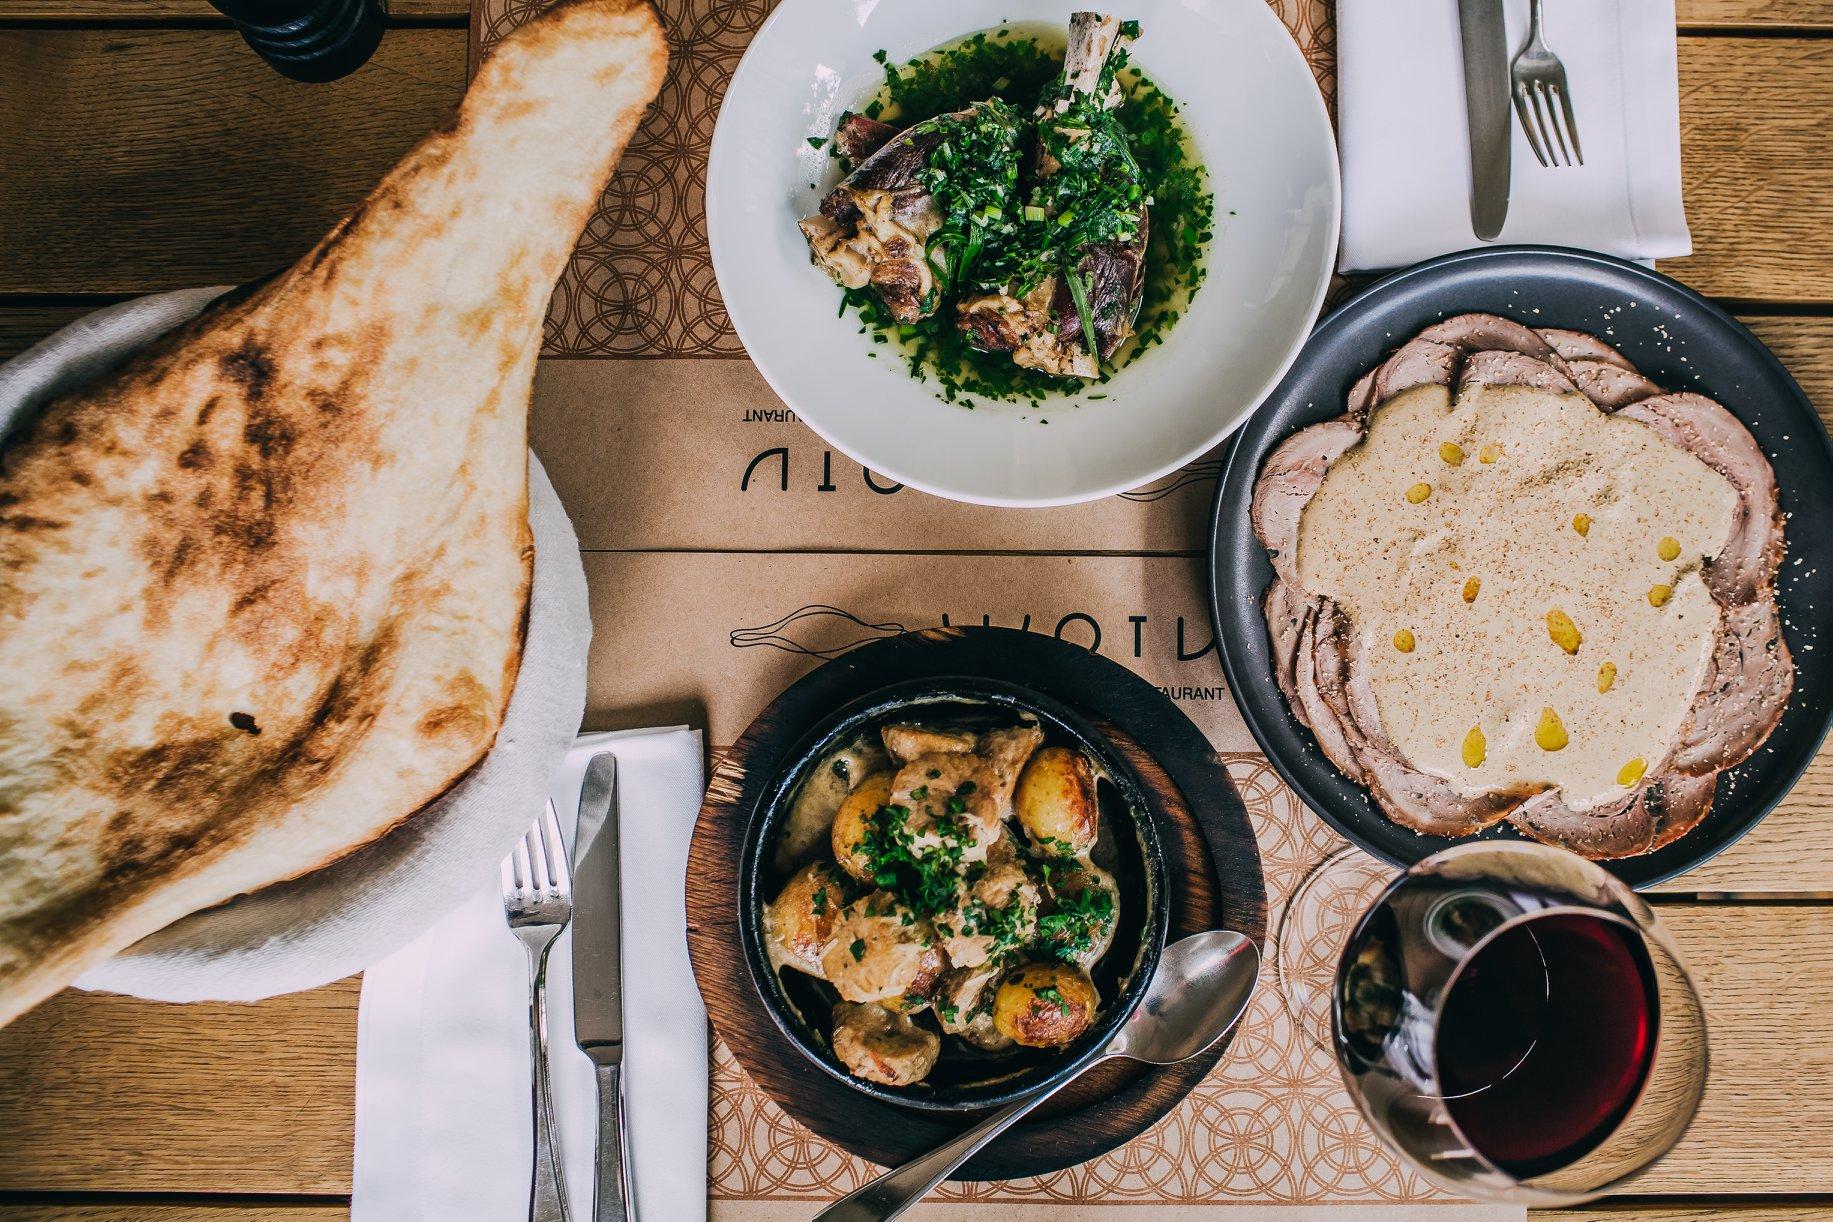 «Shoti» Georgian cuisine restaurants in Kyiv